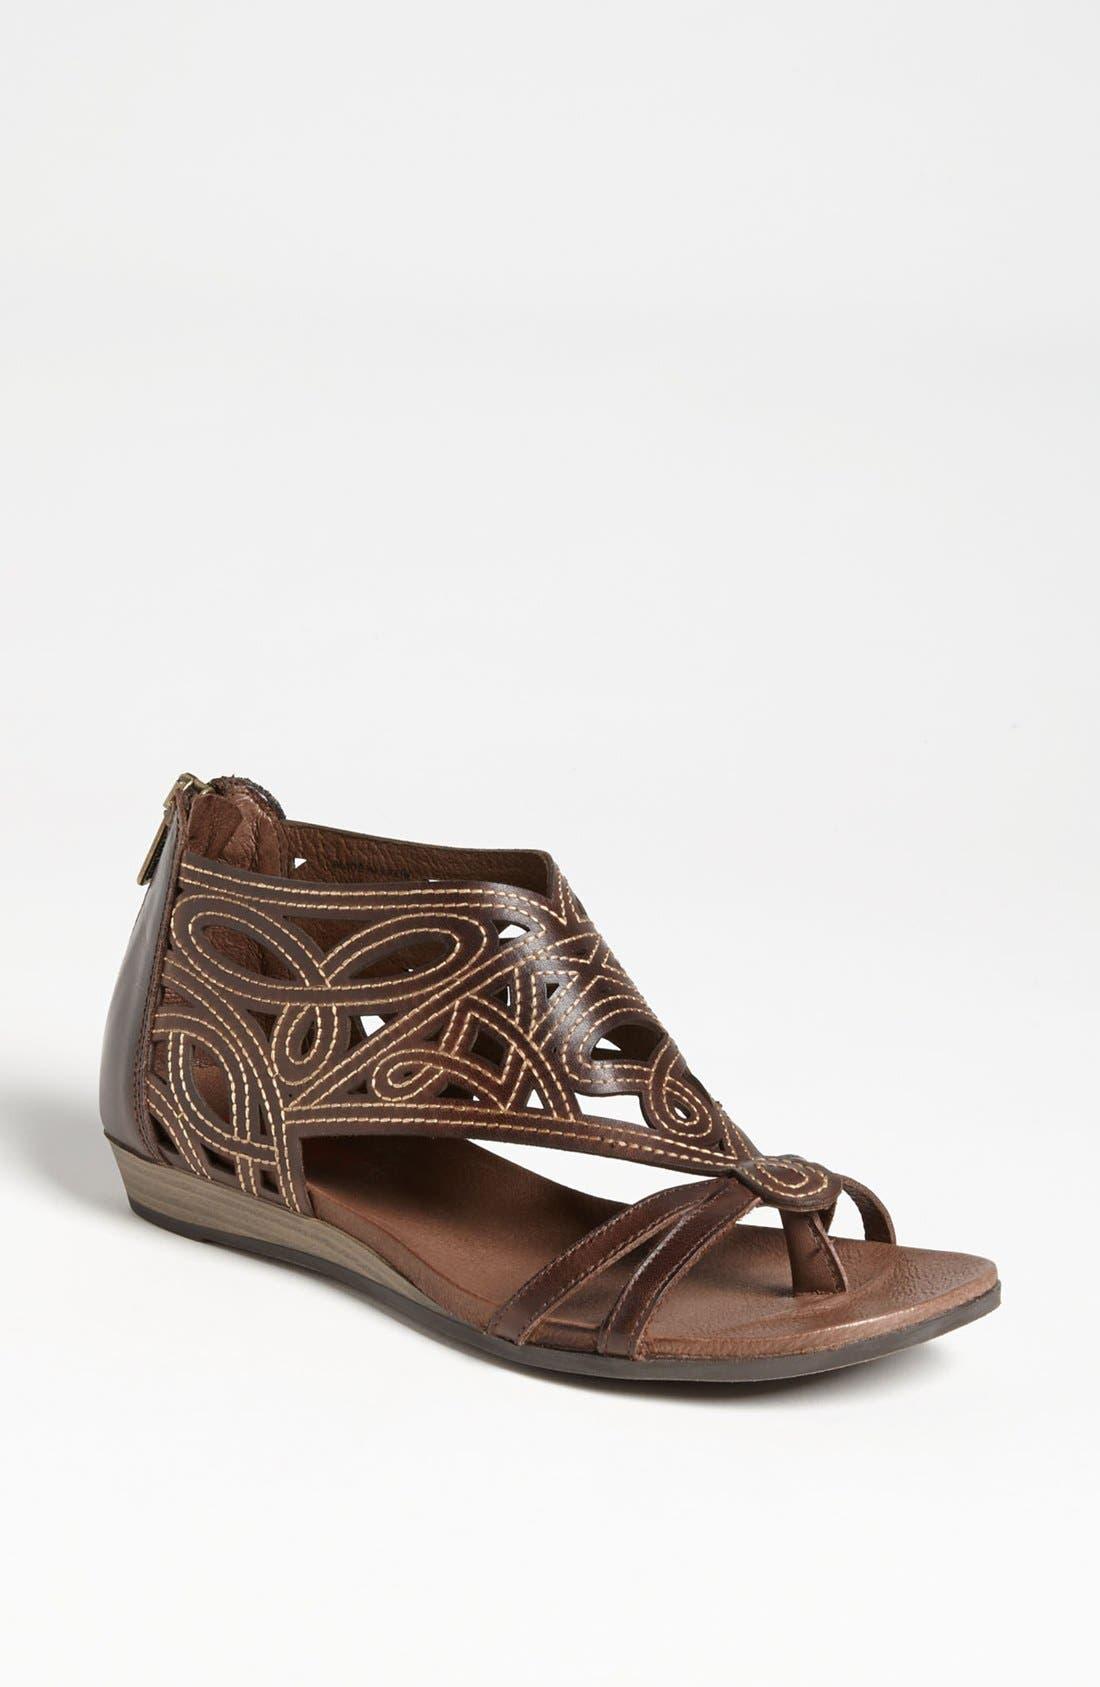 Alternate Image 1 Selected - PIKOLINOS 'Alcudia' Thong Sandal